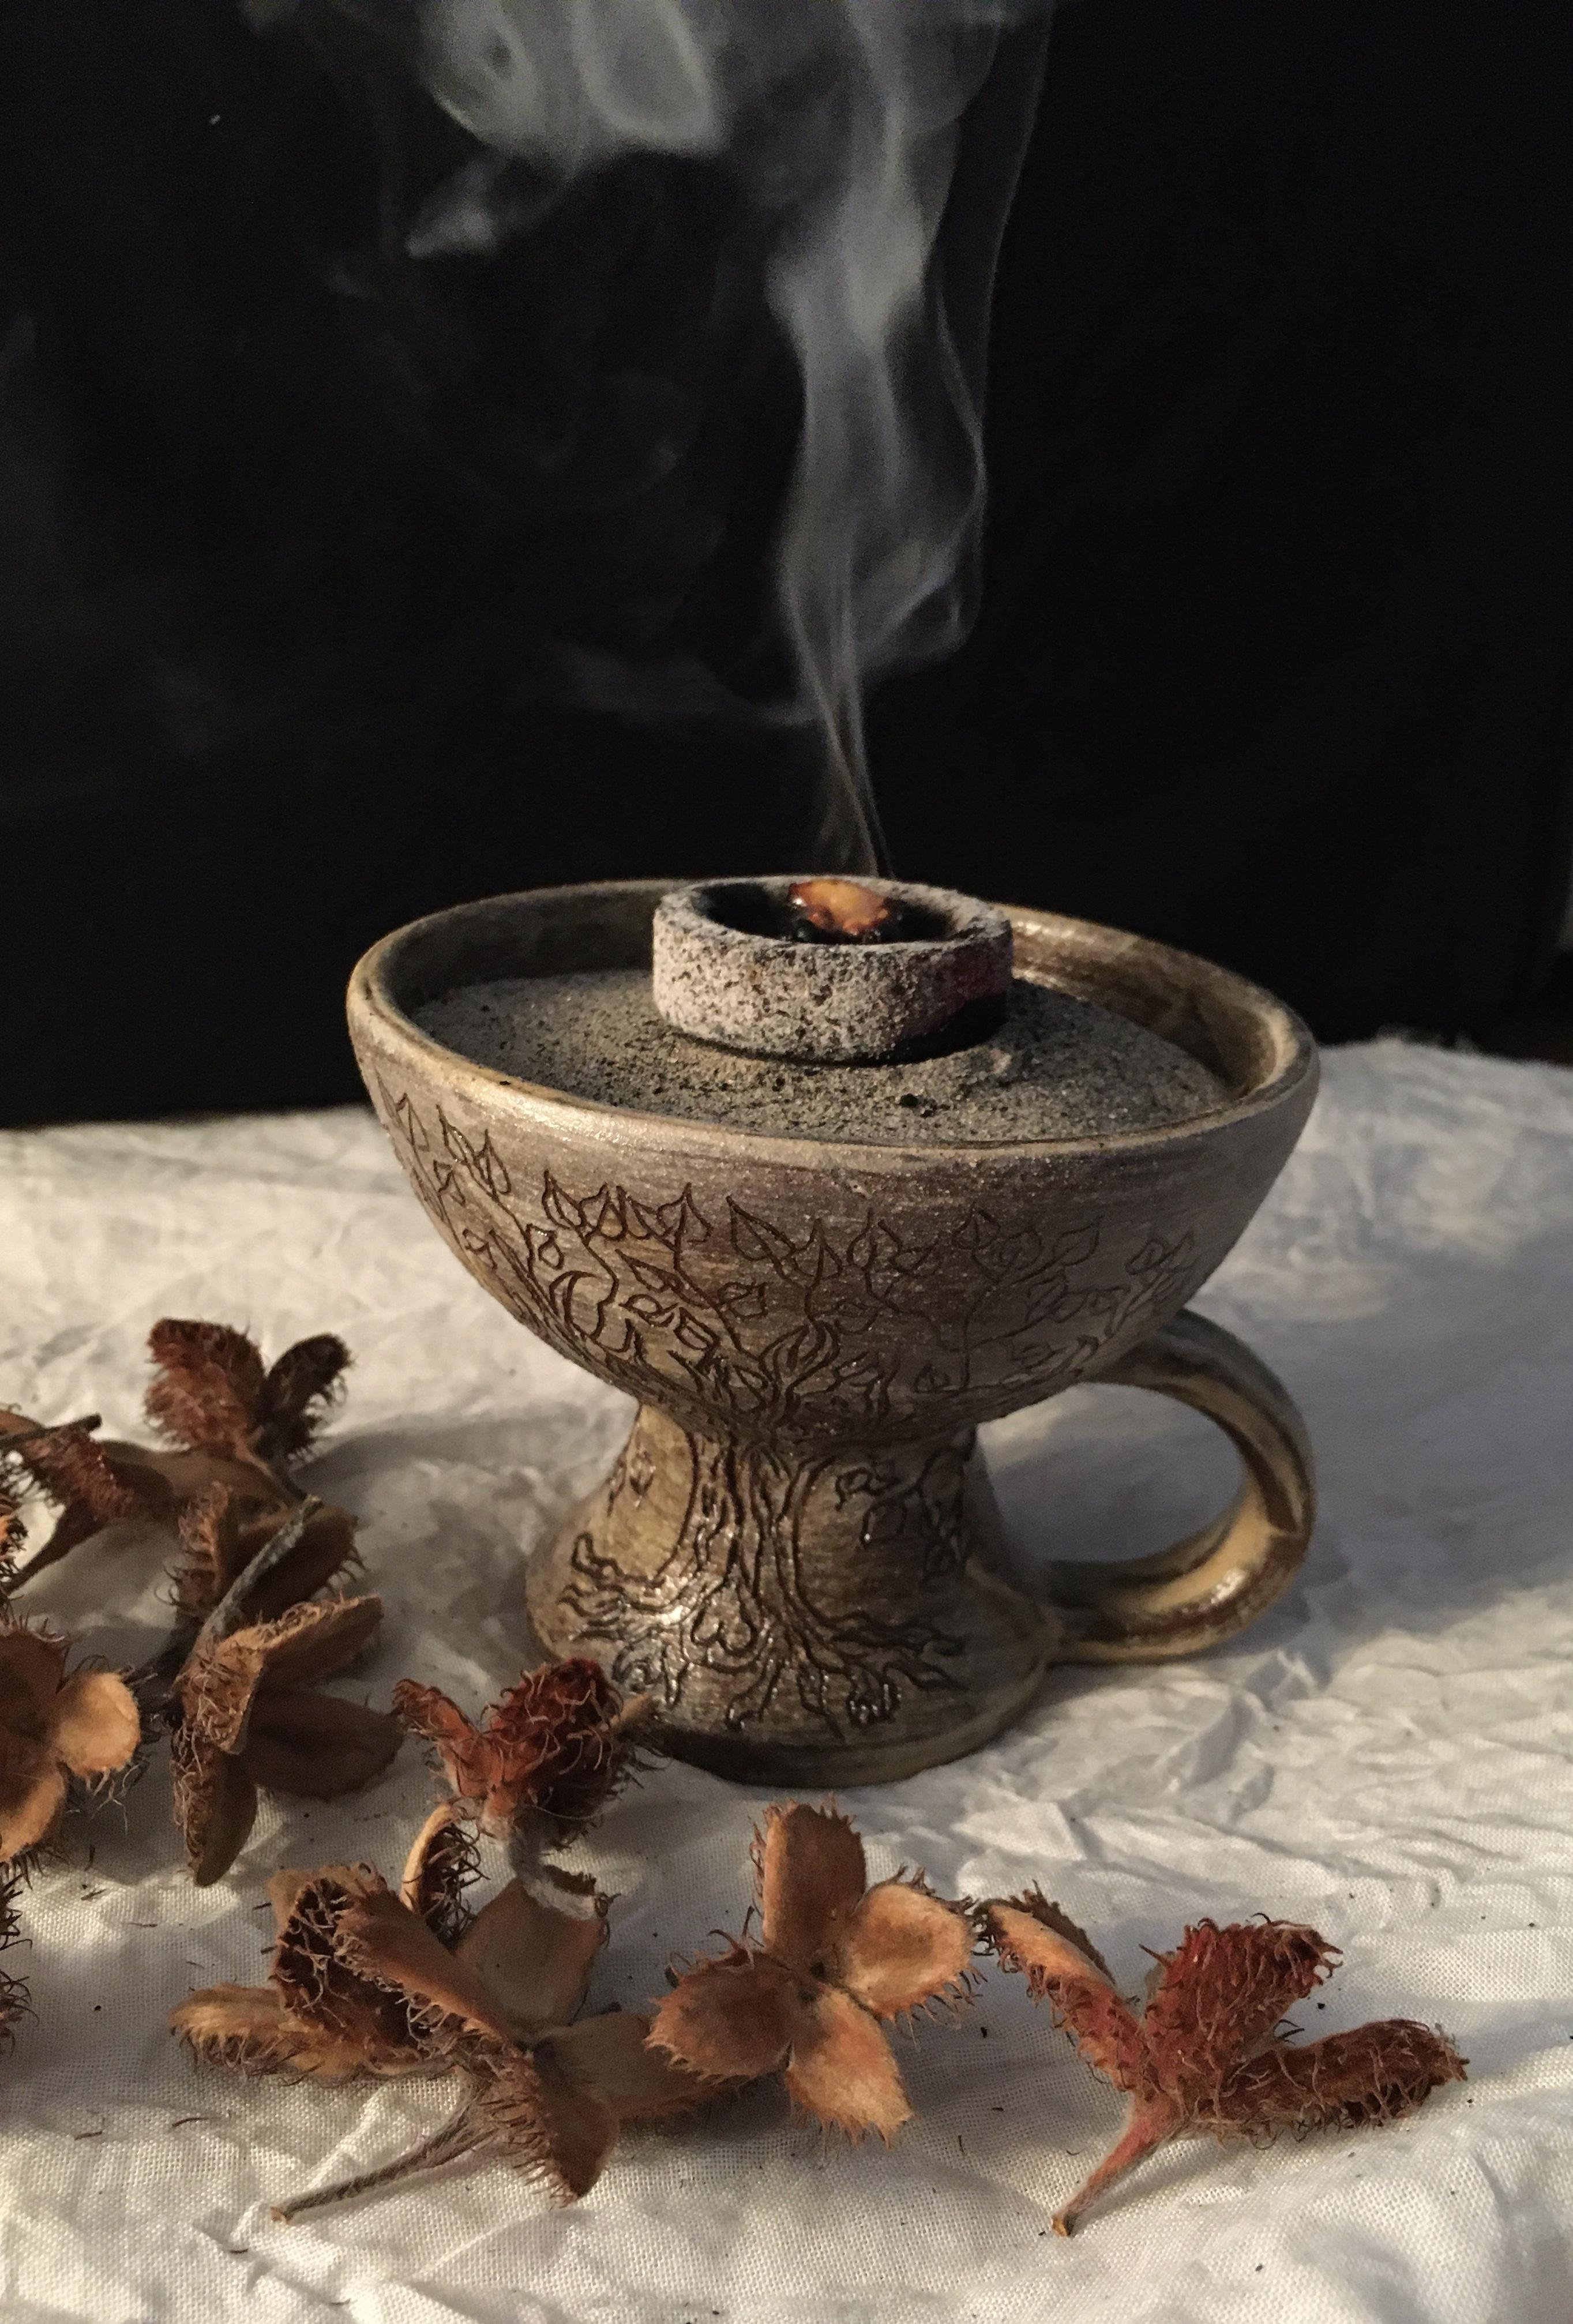 Räucherschale - incense bowl